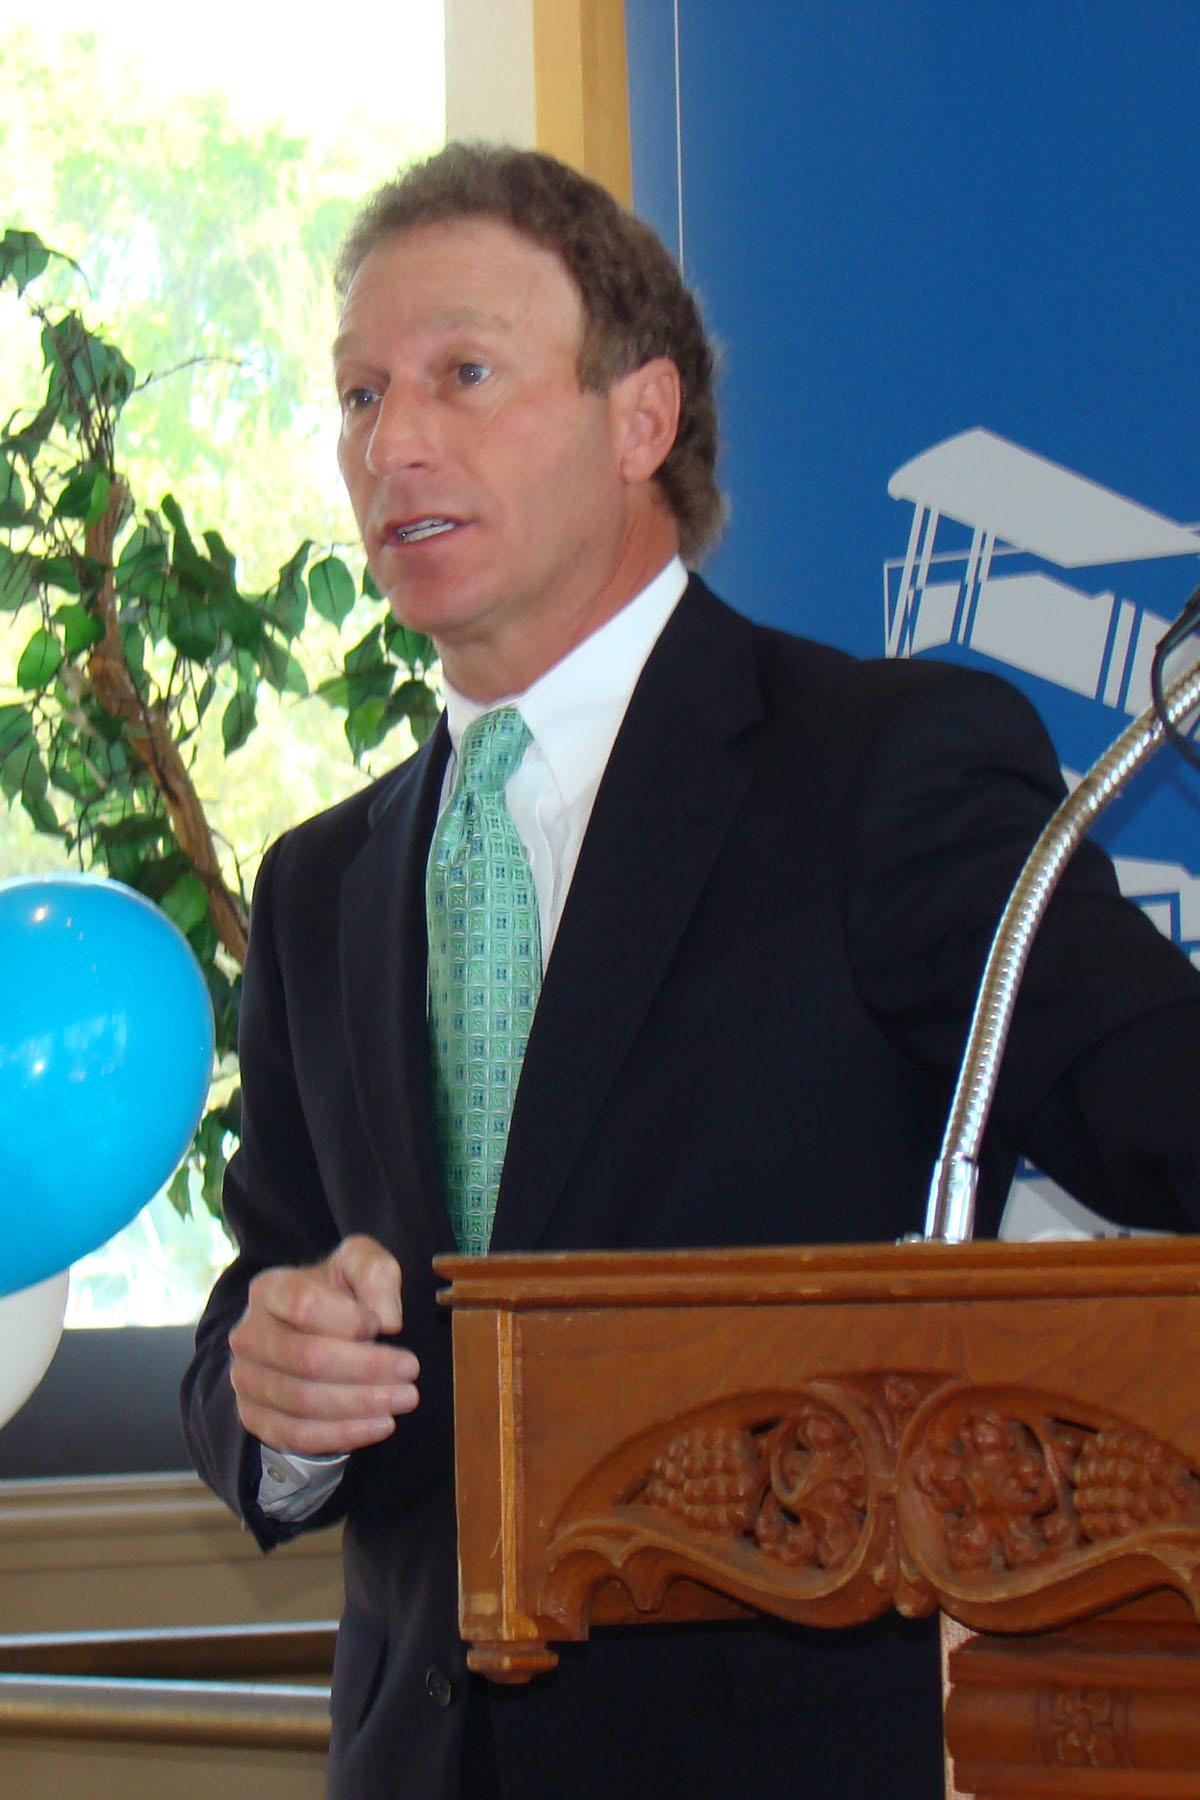 David Hilfman - Acceptance Remarks @ SPMOH, 27 Mar '08.jpg